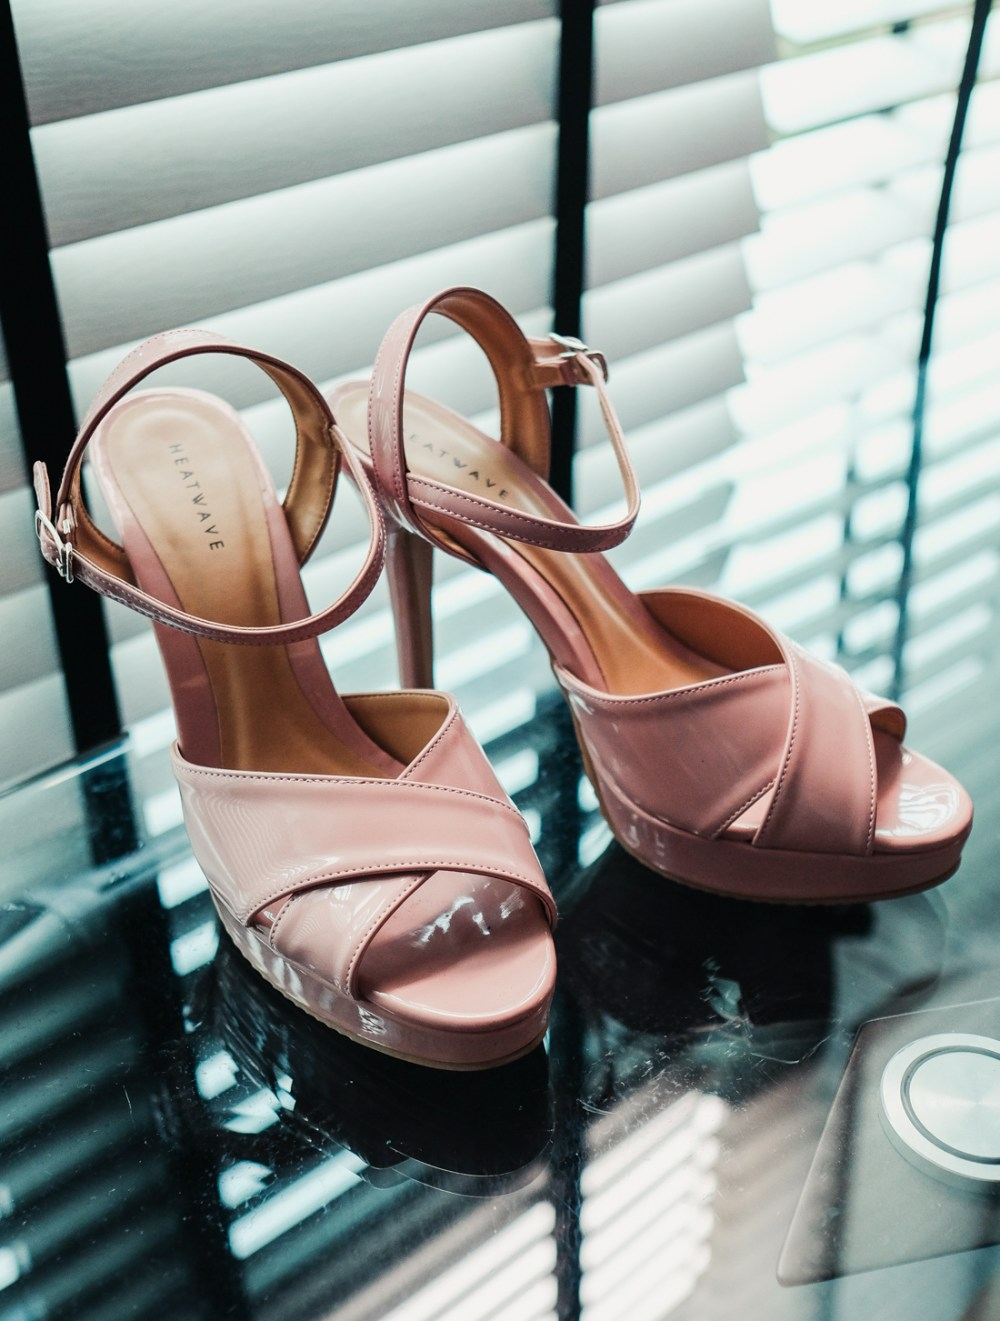 Heatwave Shoes Classic Heels-4